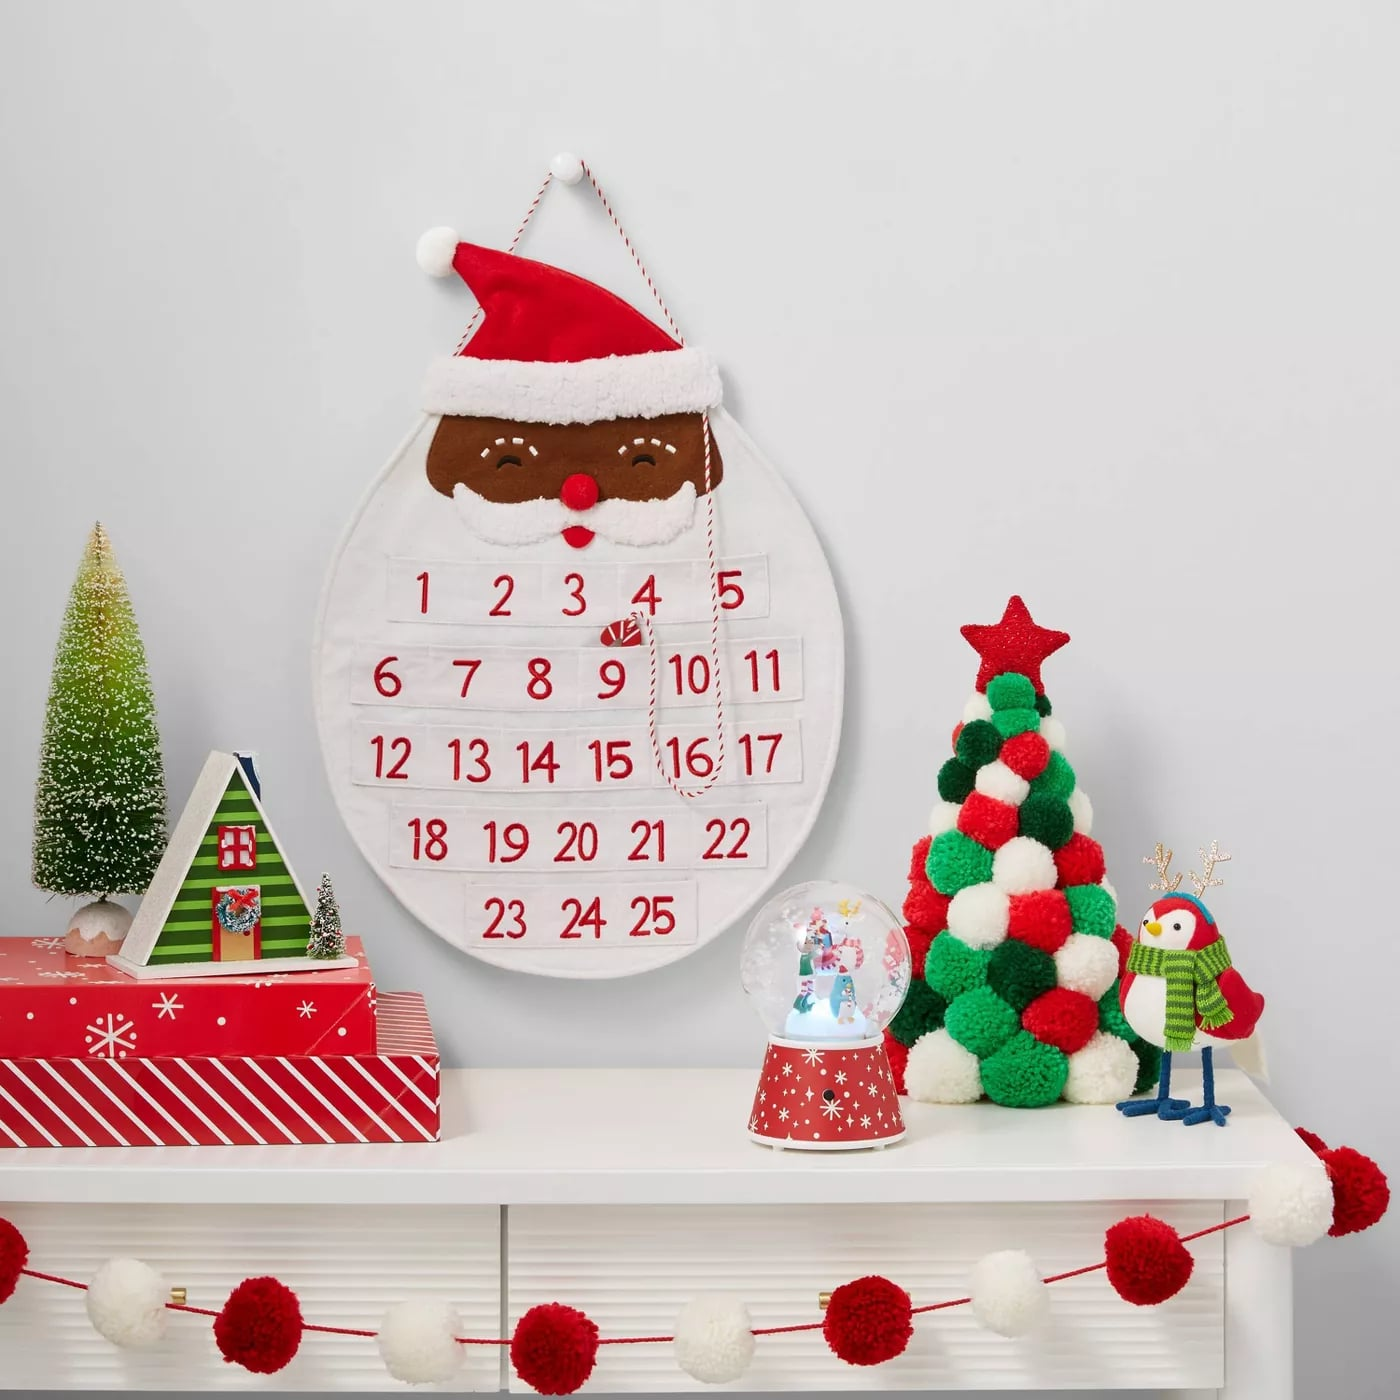 Target Debuts Colourful Pom Pom Christmas Trees And Wreaths Popsugar Home Australia